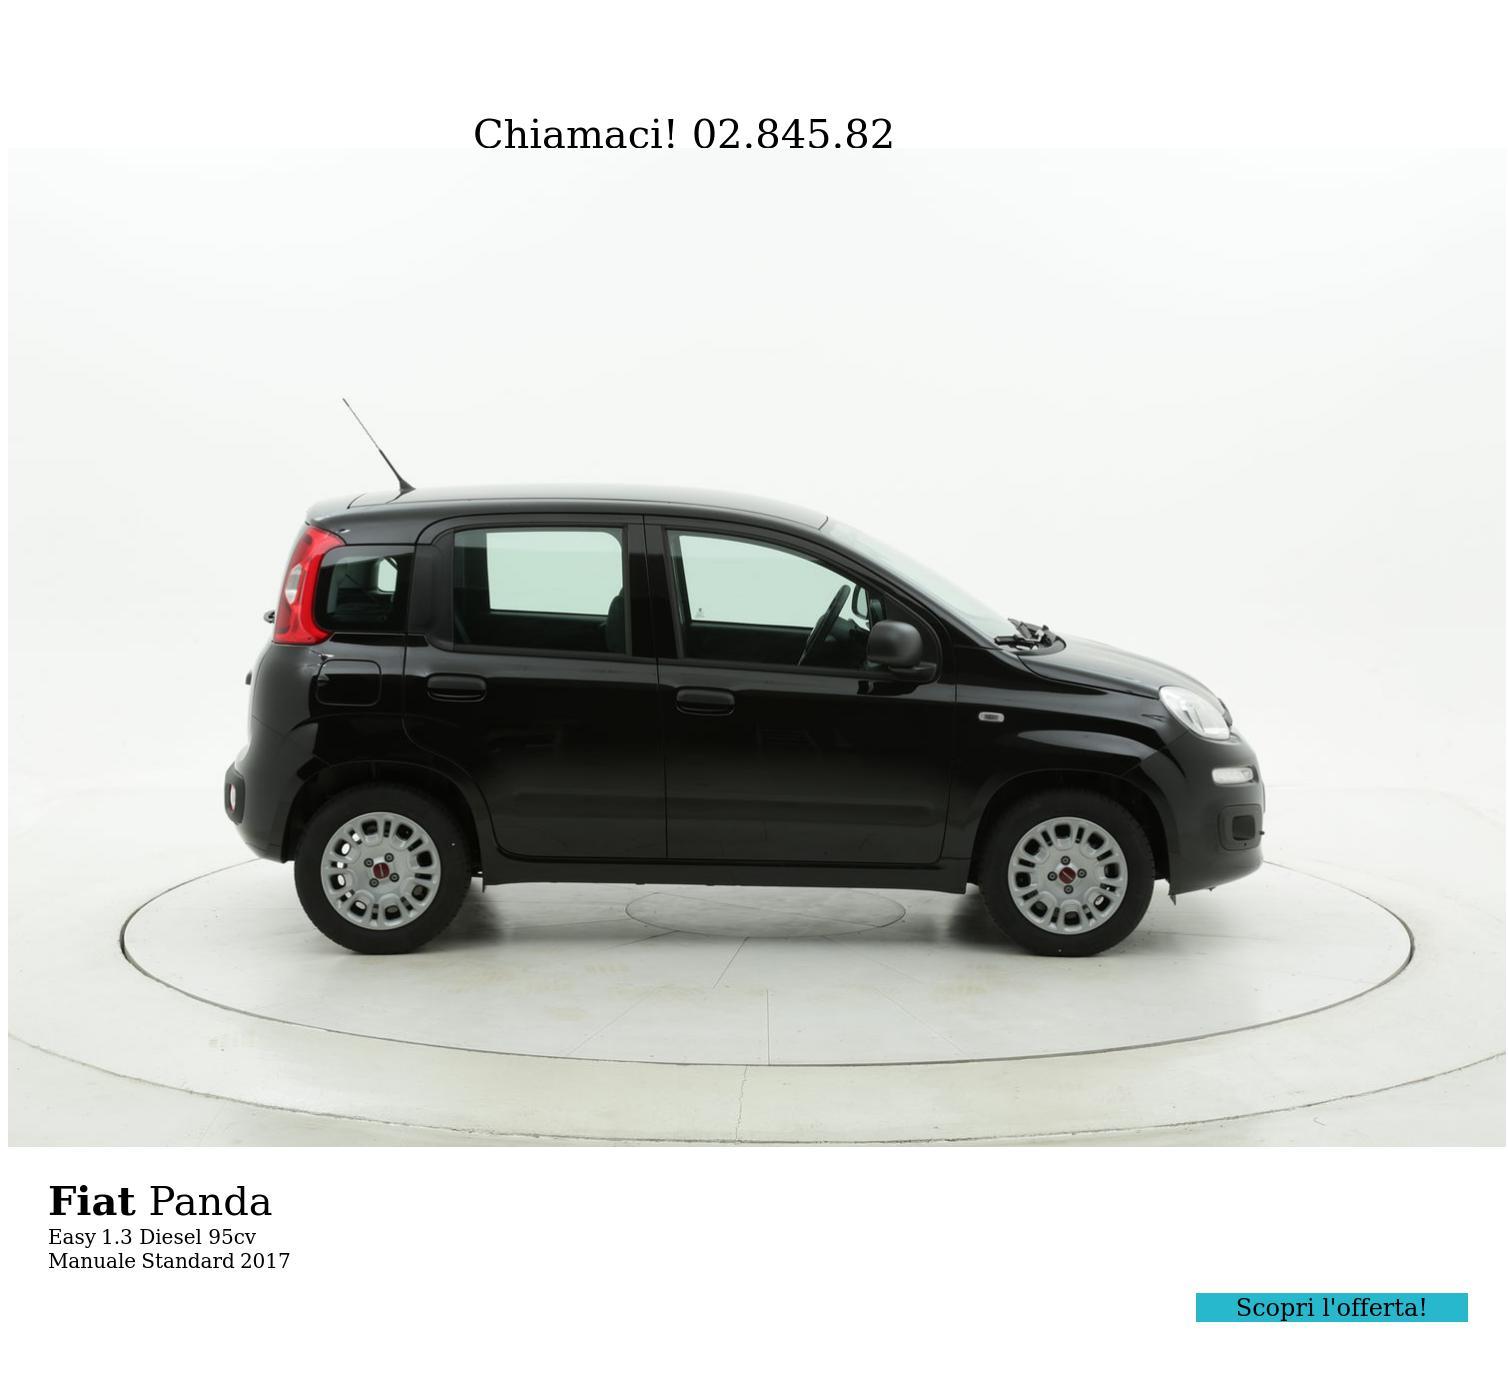 Fiat Panda Easy km 0 diesel nera | brumbrum